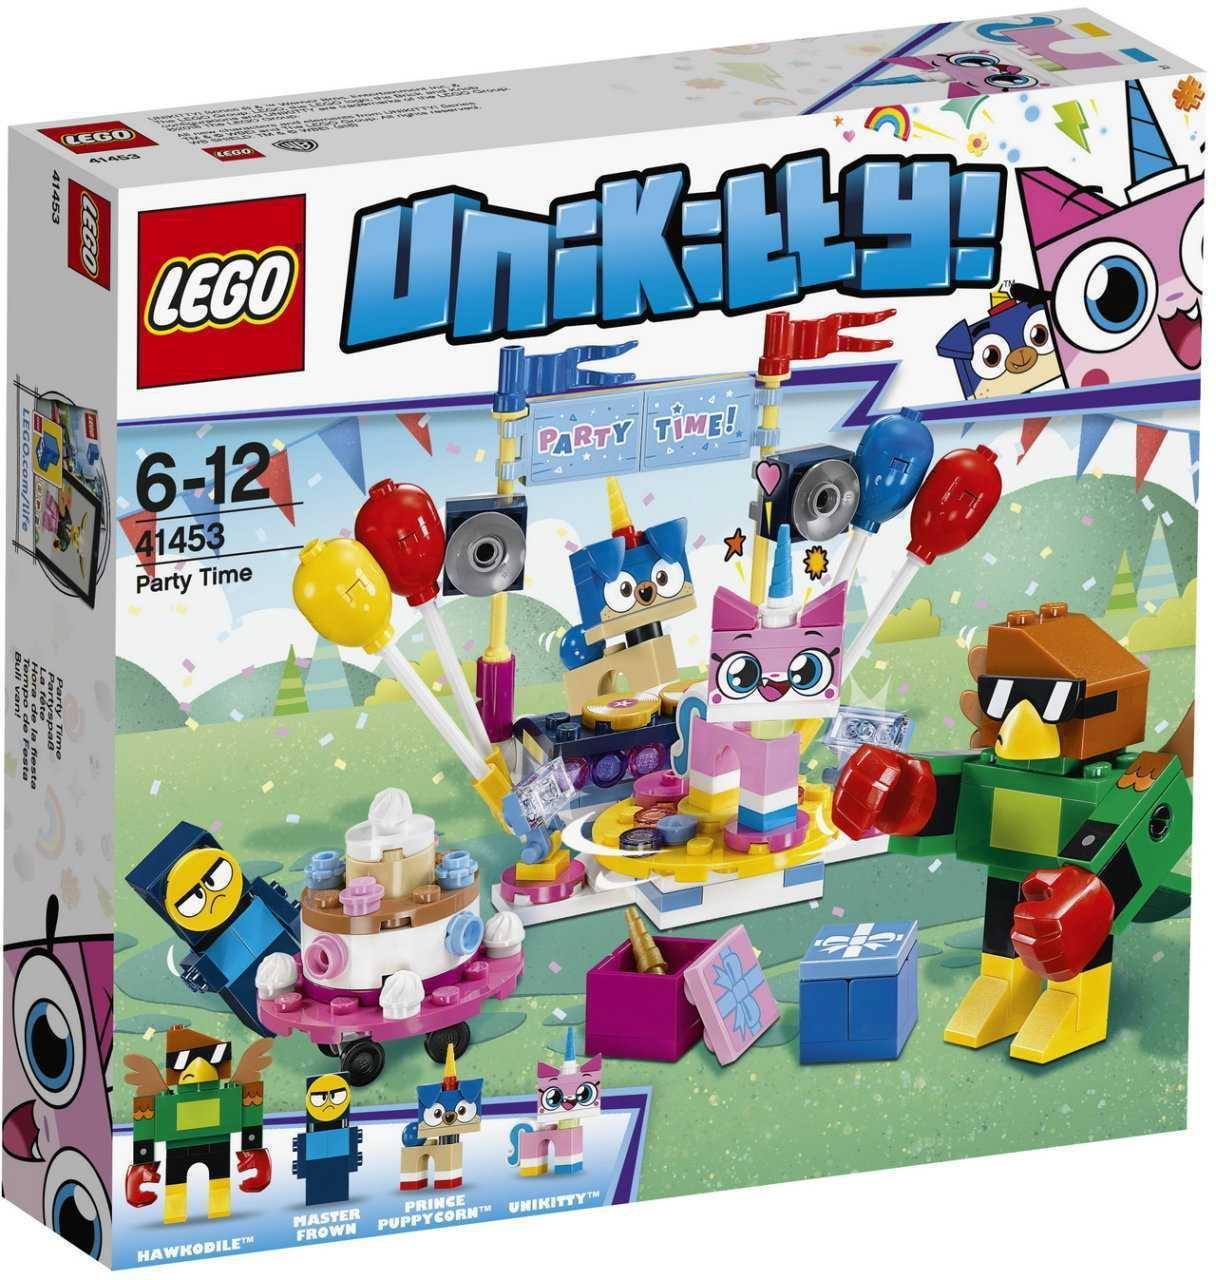 41453 Lego Unikitty Вечеринка, Лего Юникитти